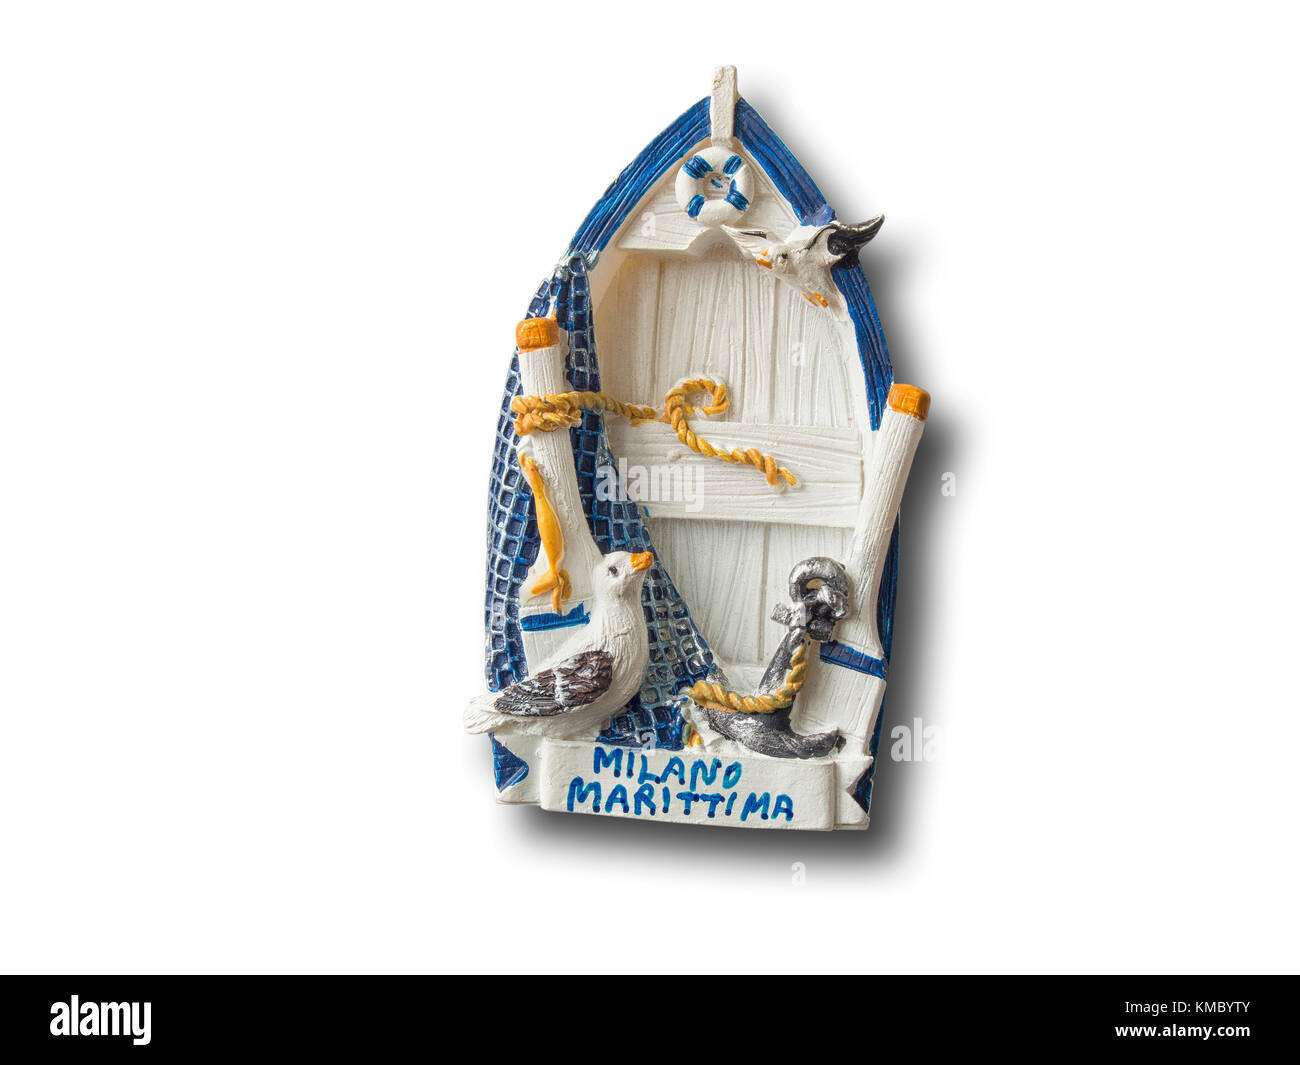 Milano Marittima (Italy) souvenir refrigerator magnet isolated on white background - Stock Image